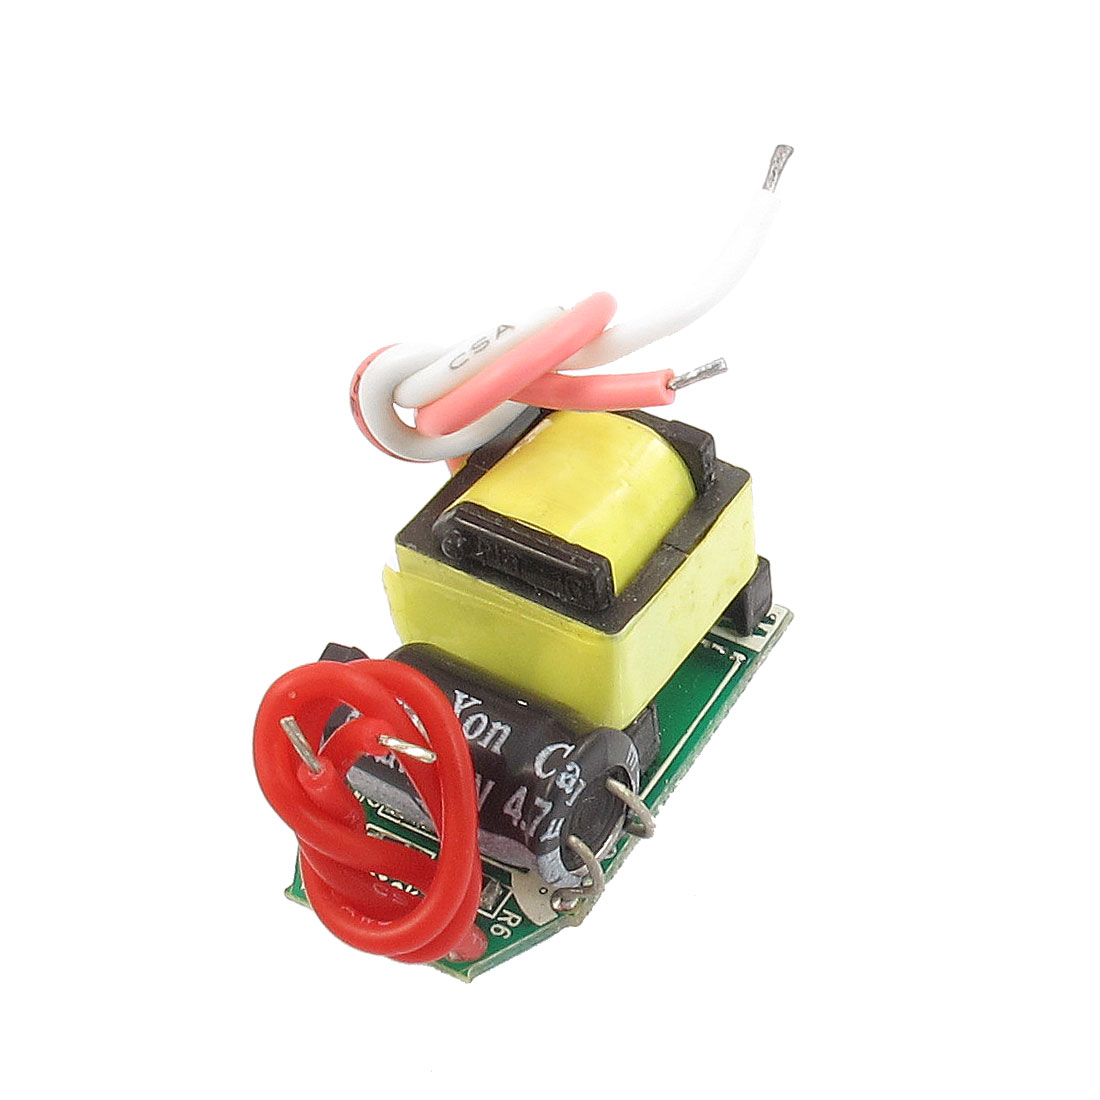 AC 85V-265V Input 8V-16V 300mA Output LED Power Supply Module